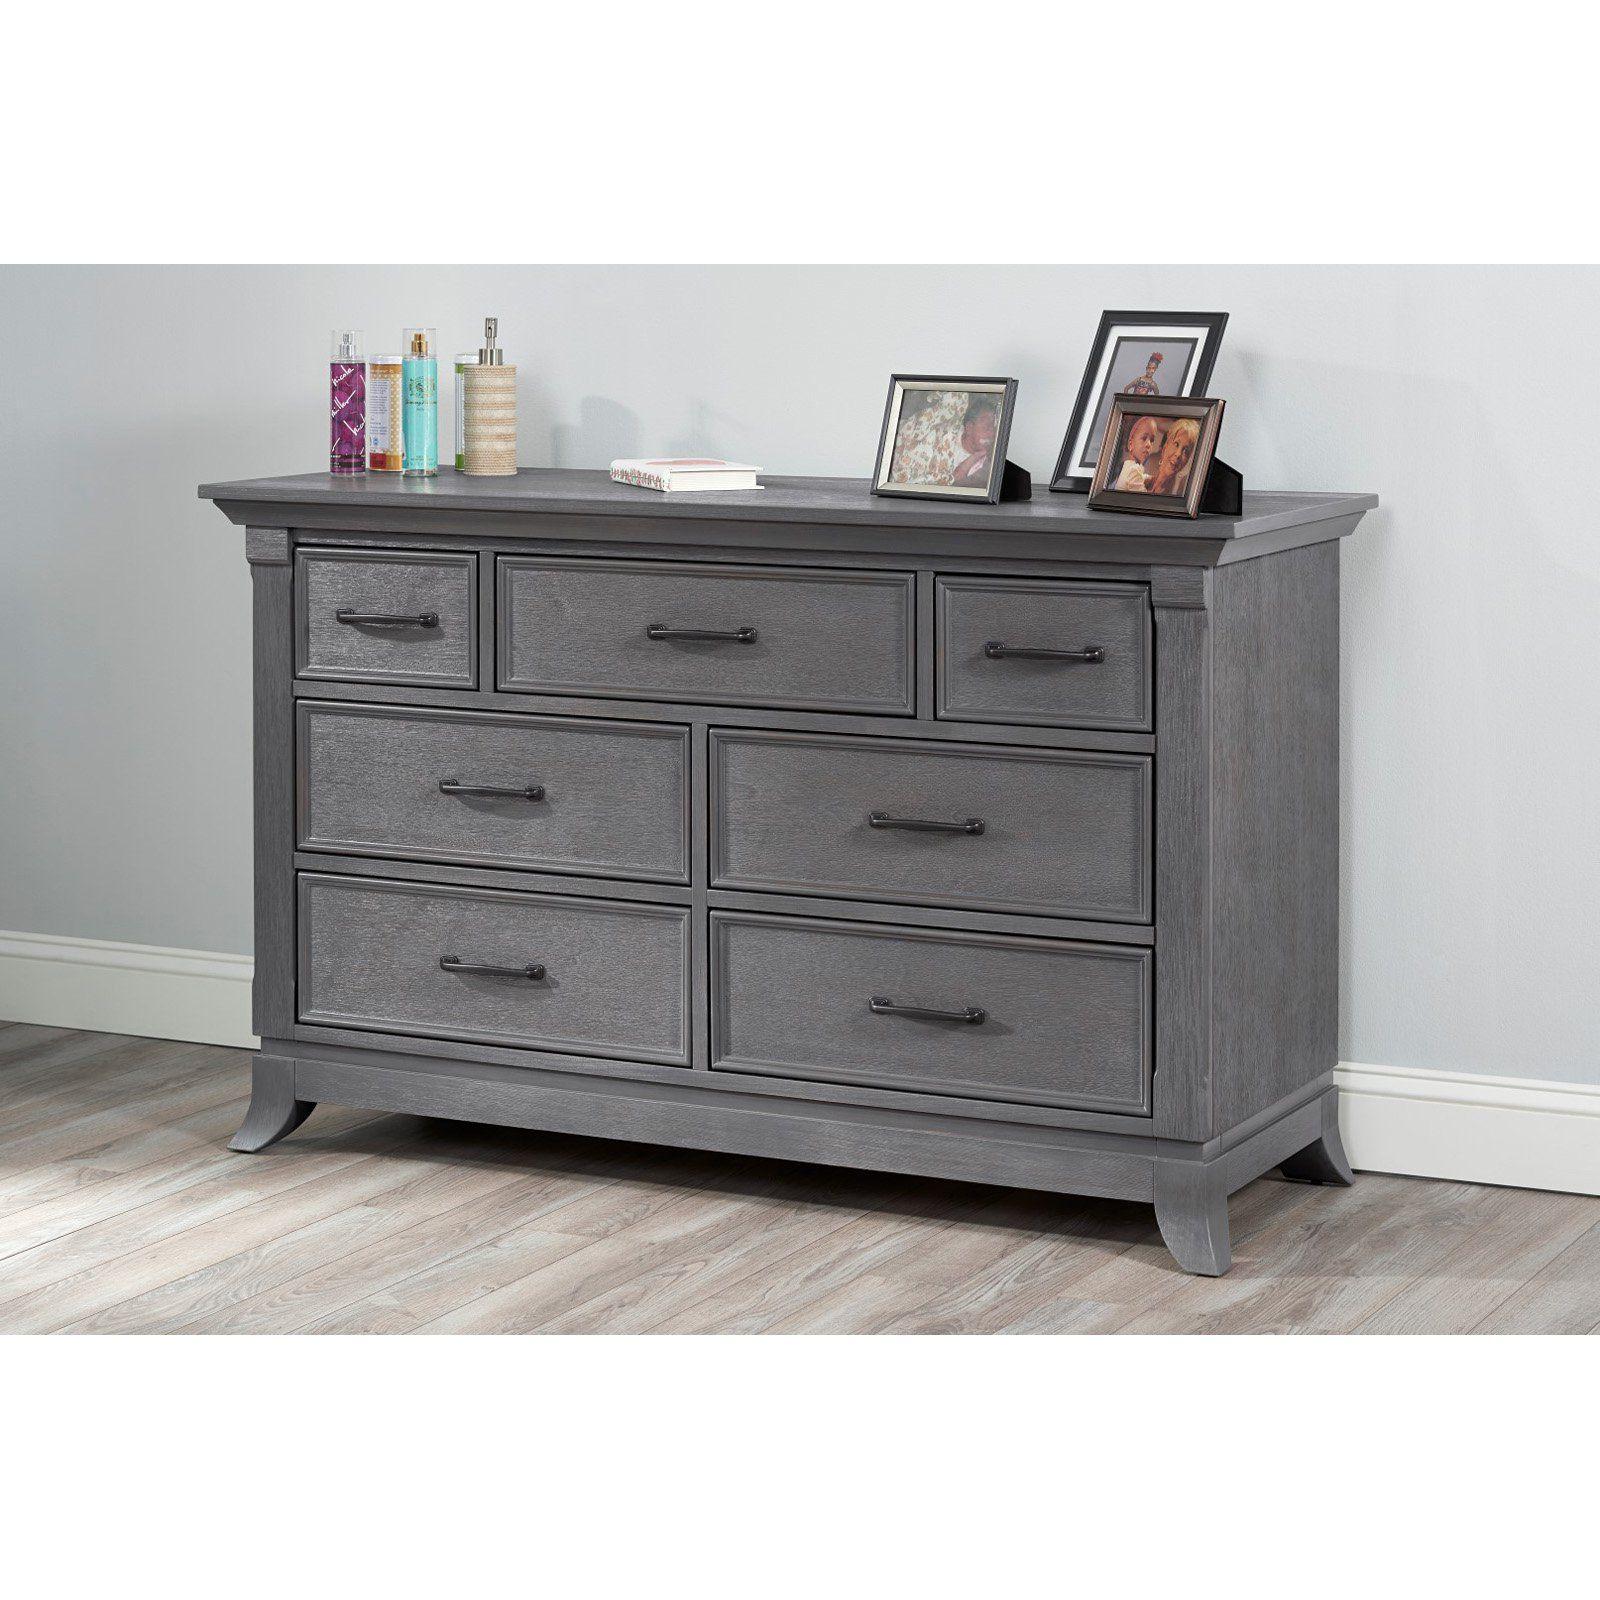 Ozlo Baby Pendleton 7 Drawer Dresser  Mdes023